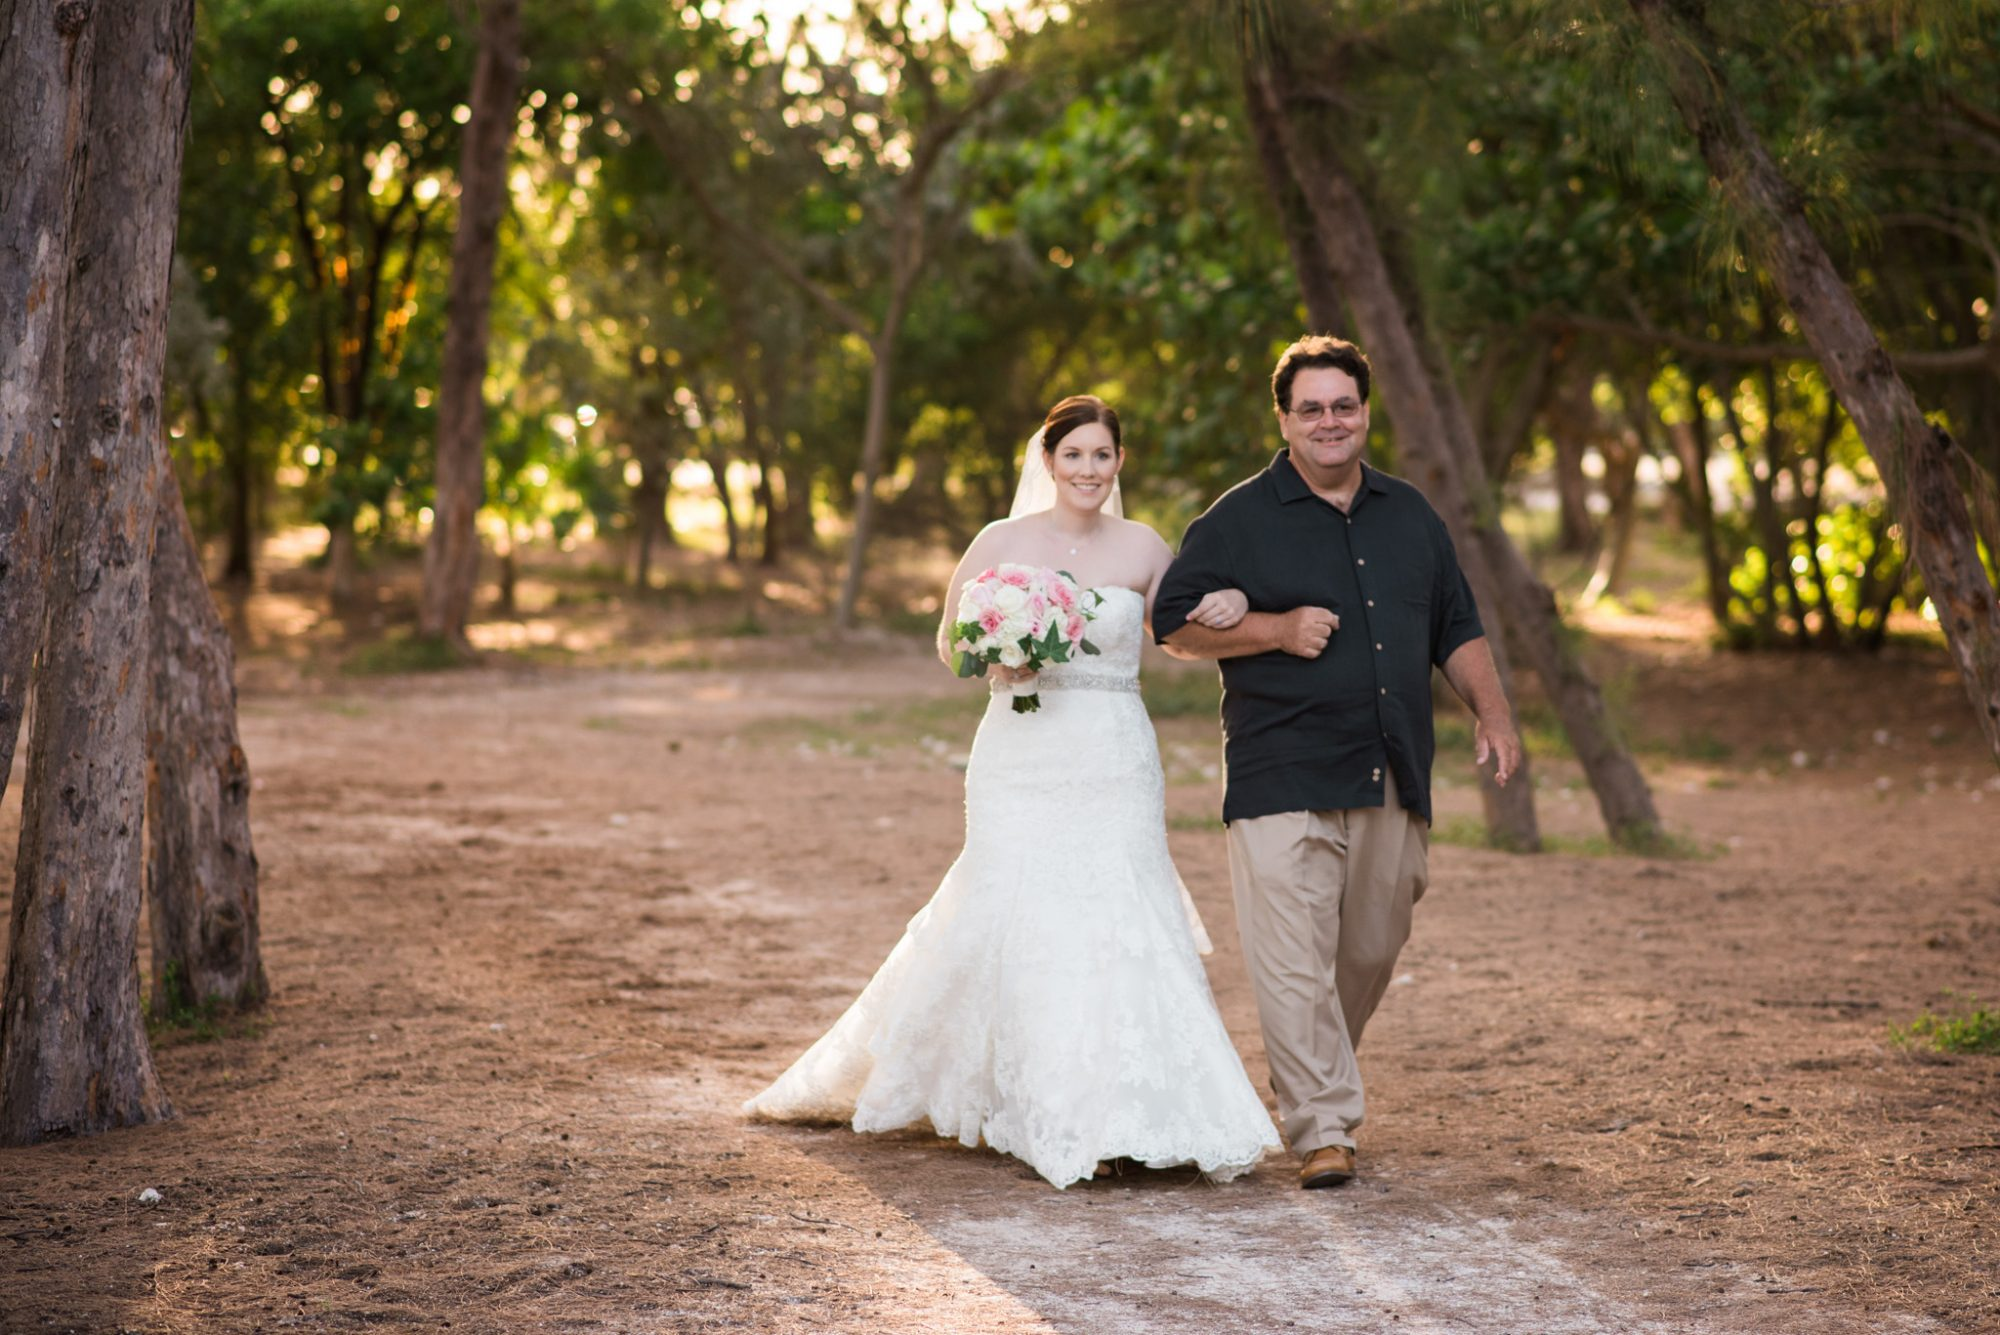 Heather Jeff Key West Wedding Photographer Fort Zachary Taylor 17 - Heather & Jeff - Key West Wedding Photographer - Fort Zachary Taylor